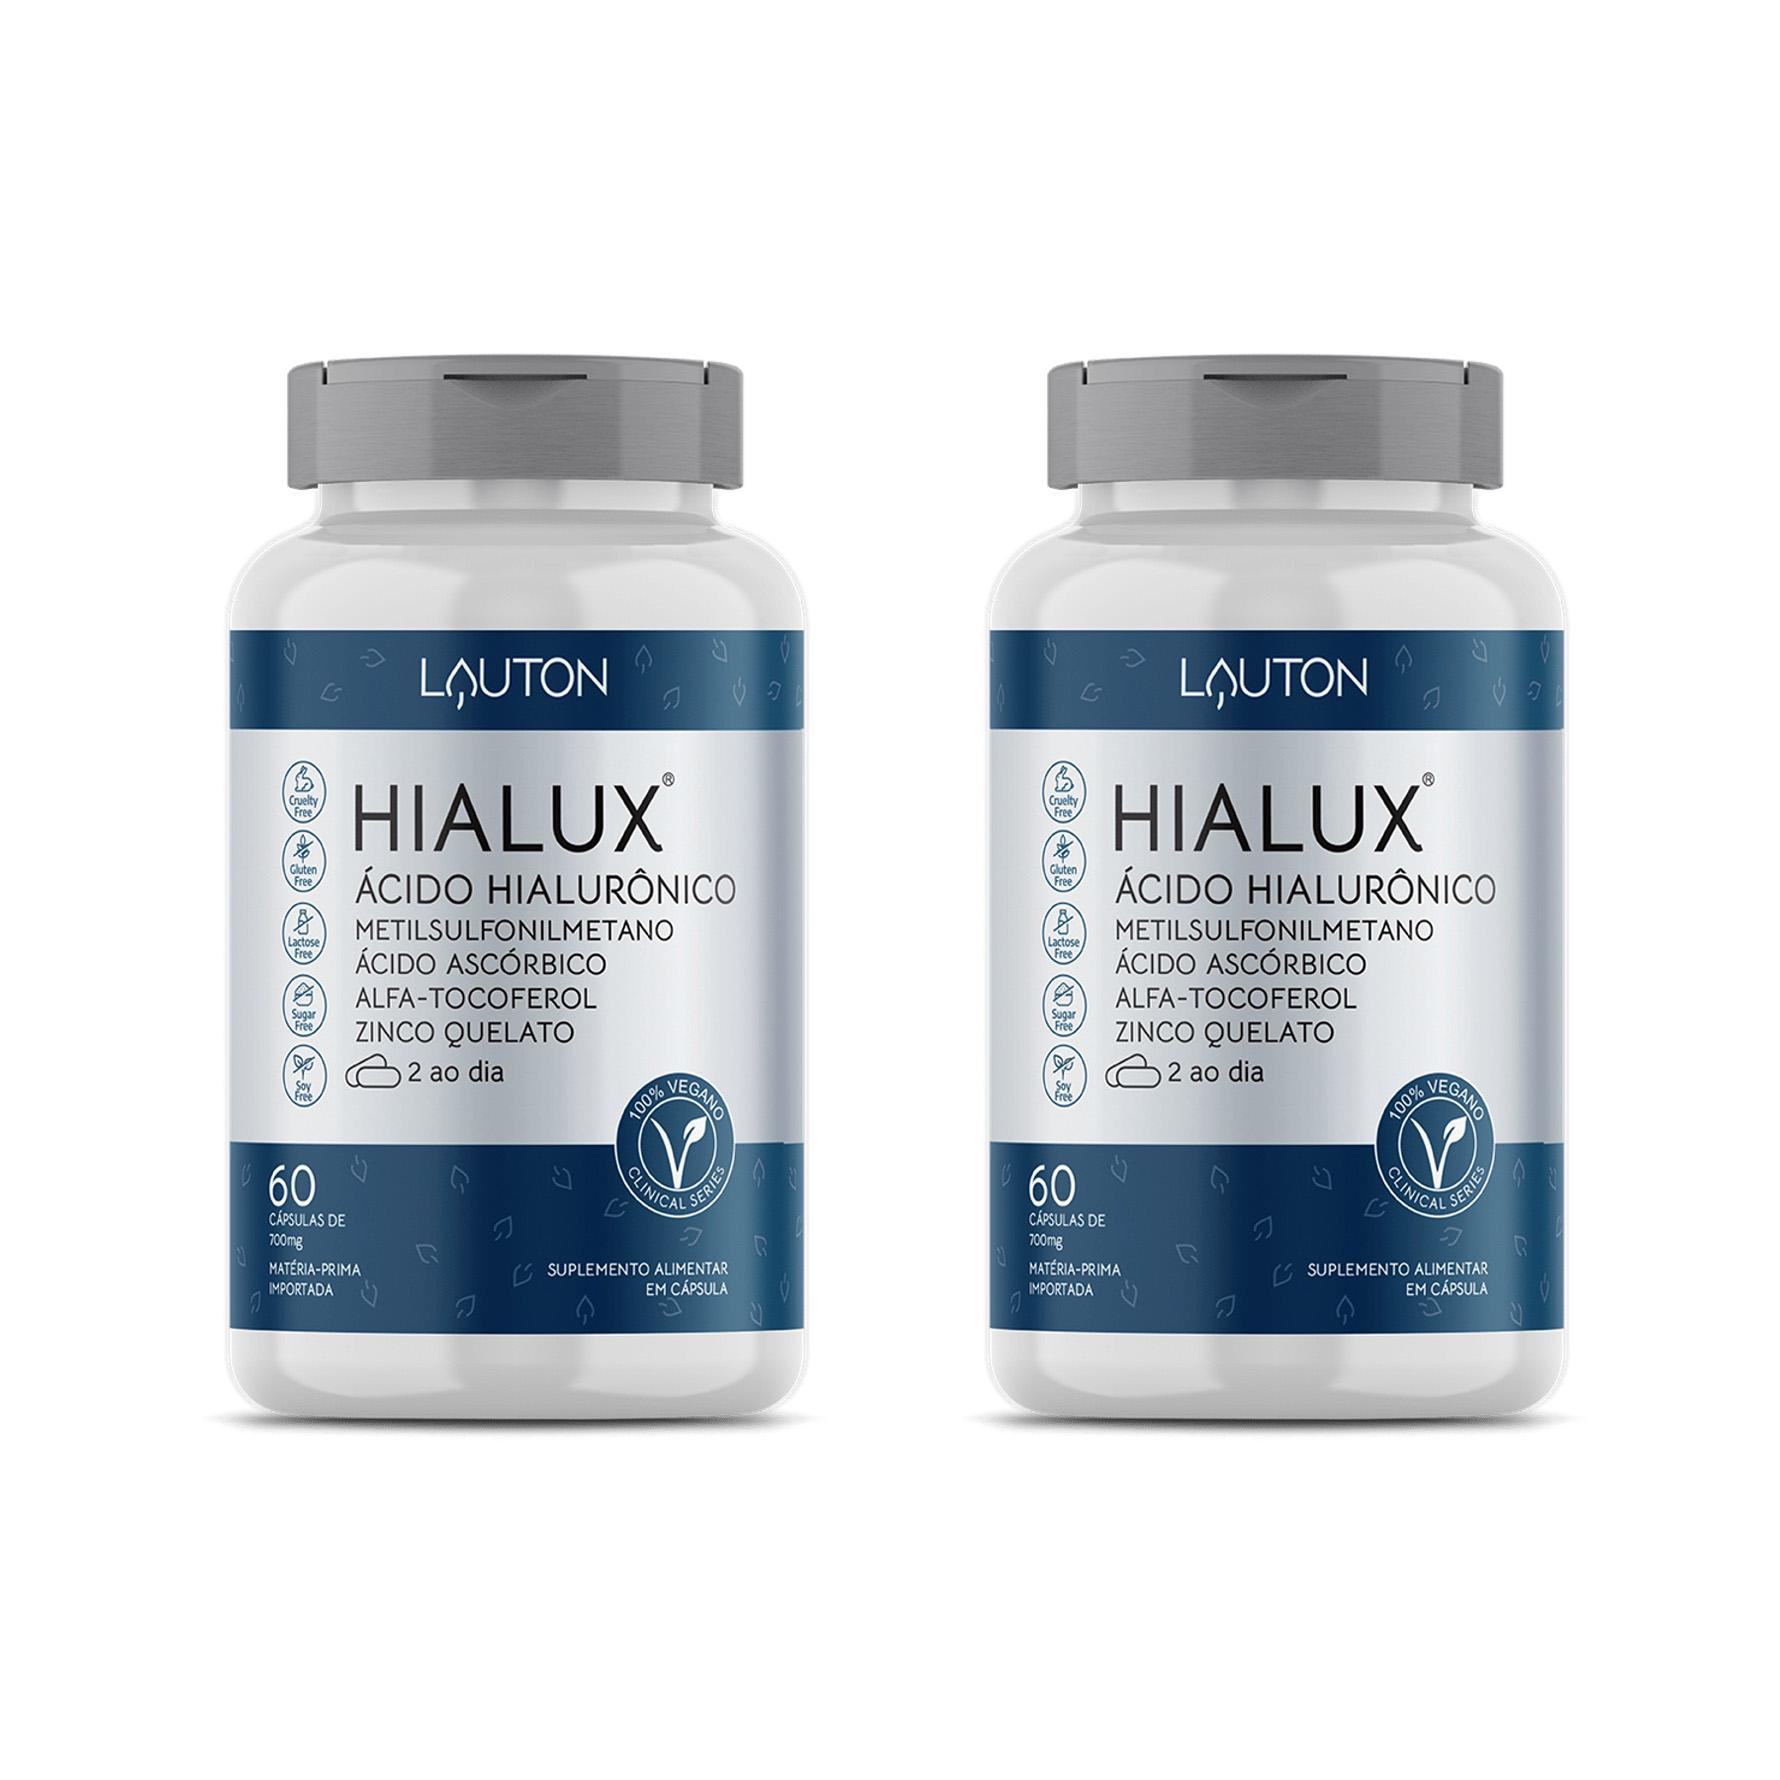 Hialux - Ácido Hialurônico - 60 Cápsulas - Lauton Nutrition (2 Unidades)